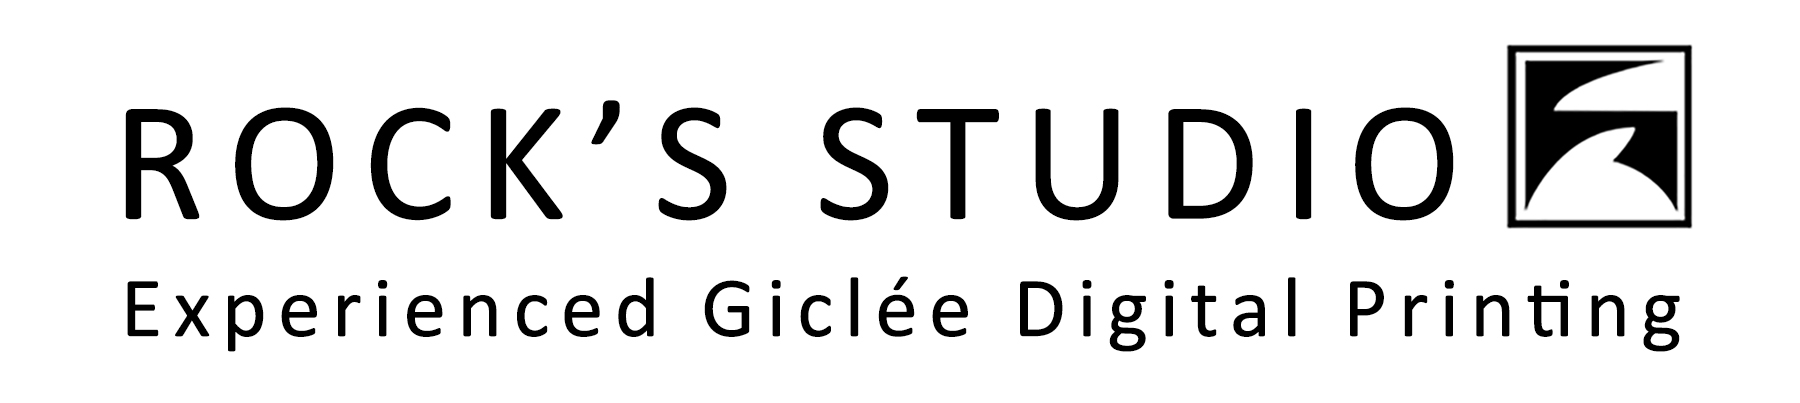 Rocks_studio logo (1).jpg